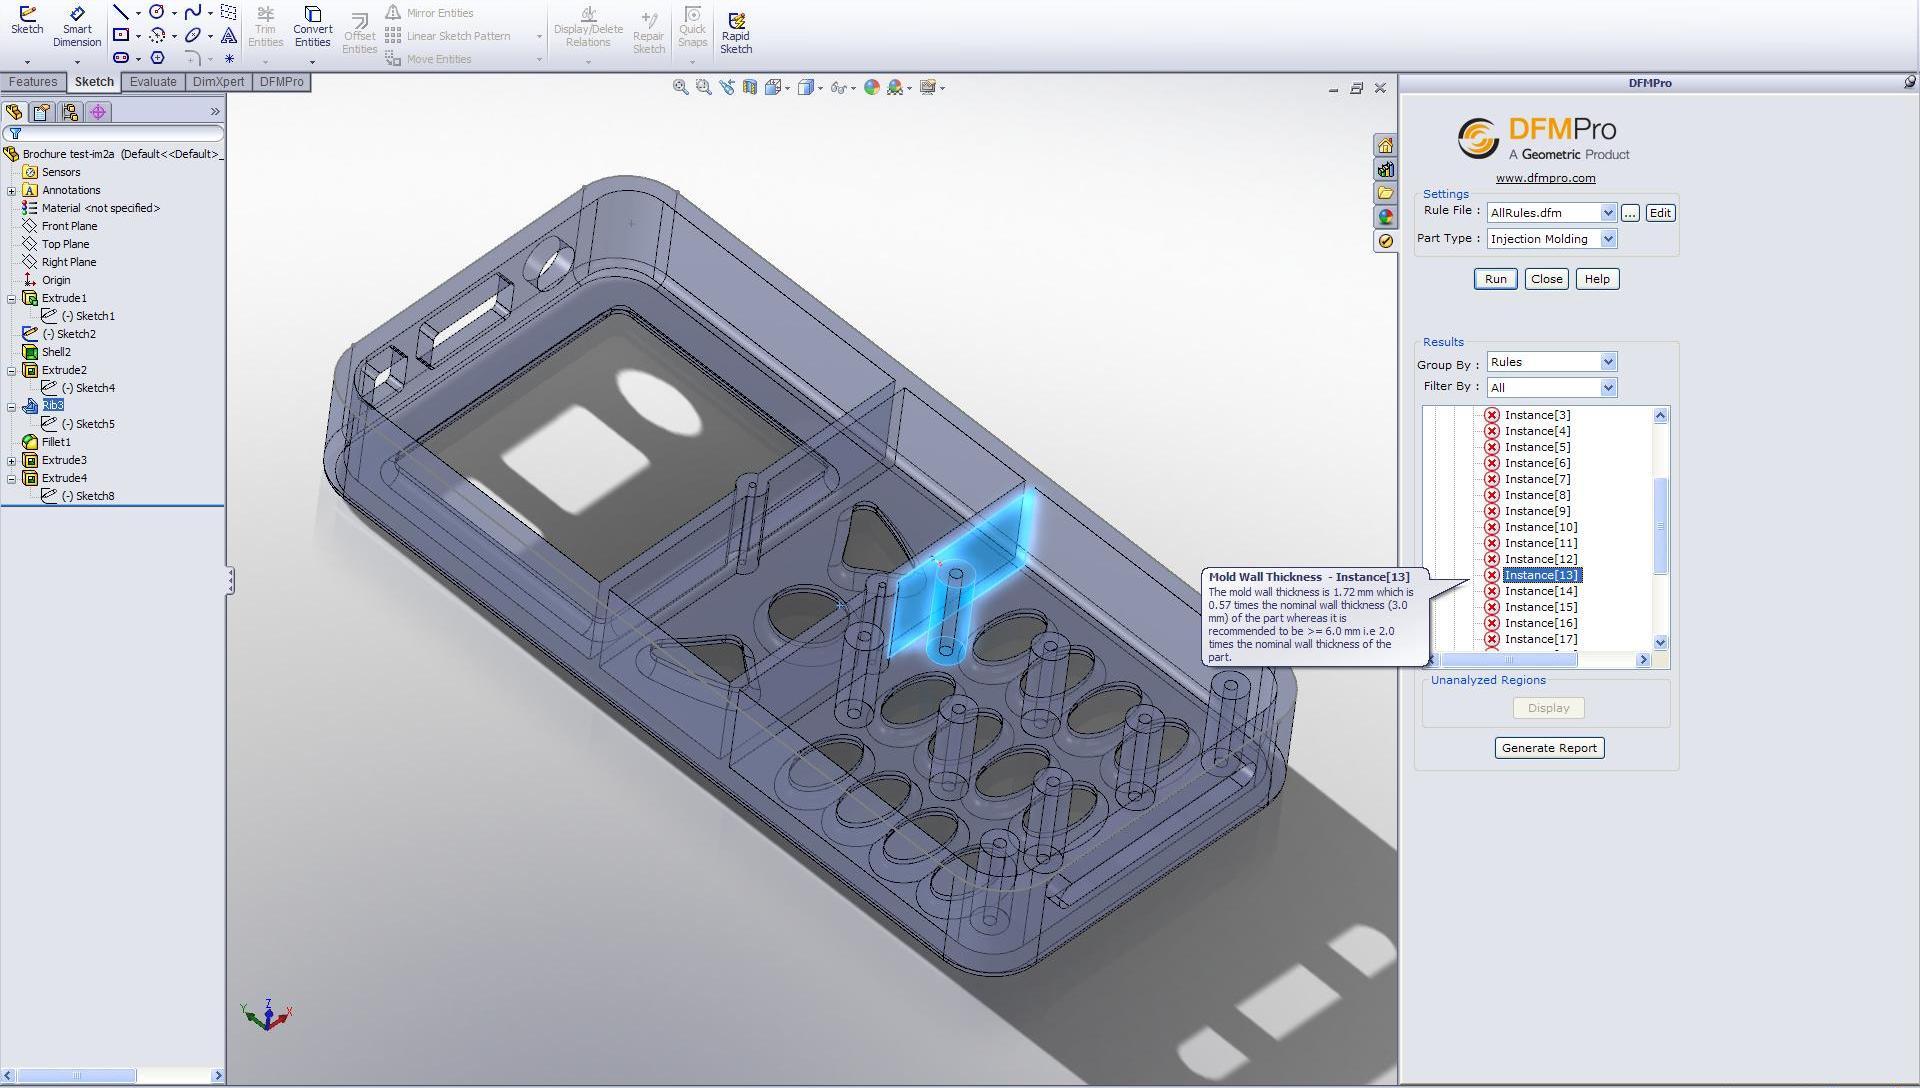 http://designformanufacturing.files.wordpress.com/2010/12/image71.jpg